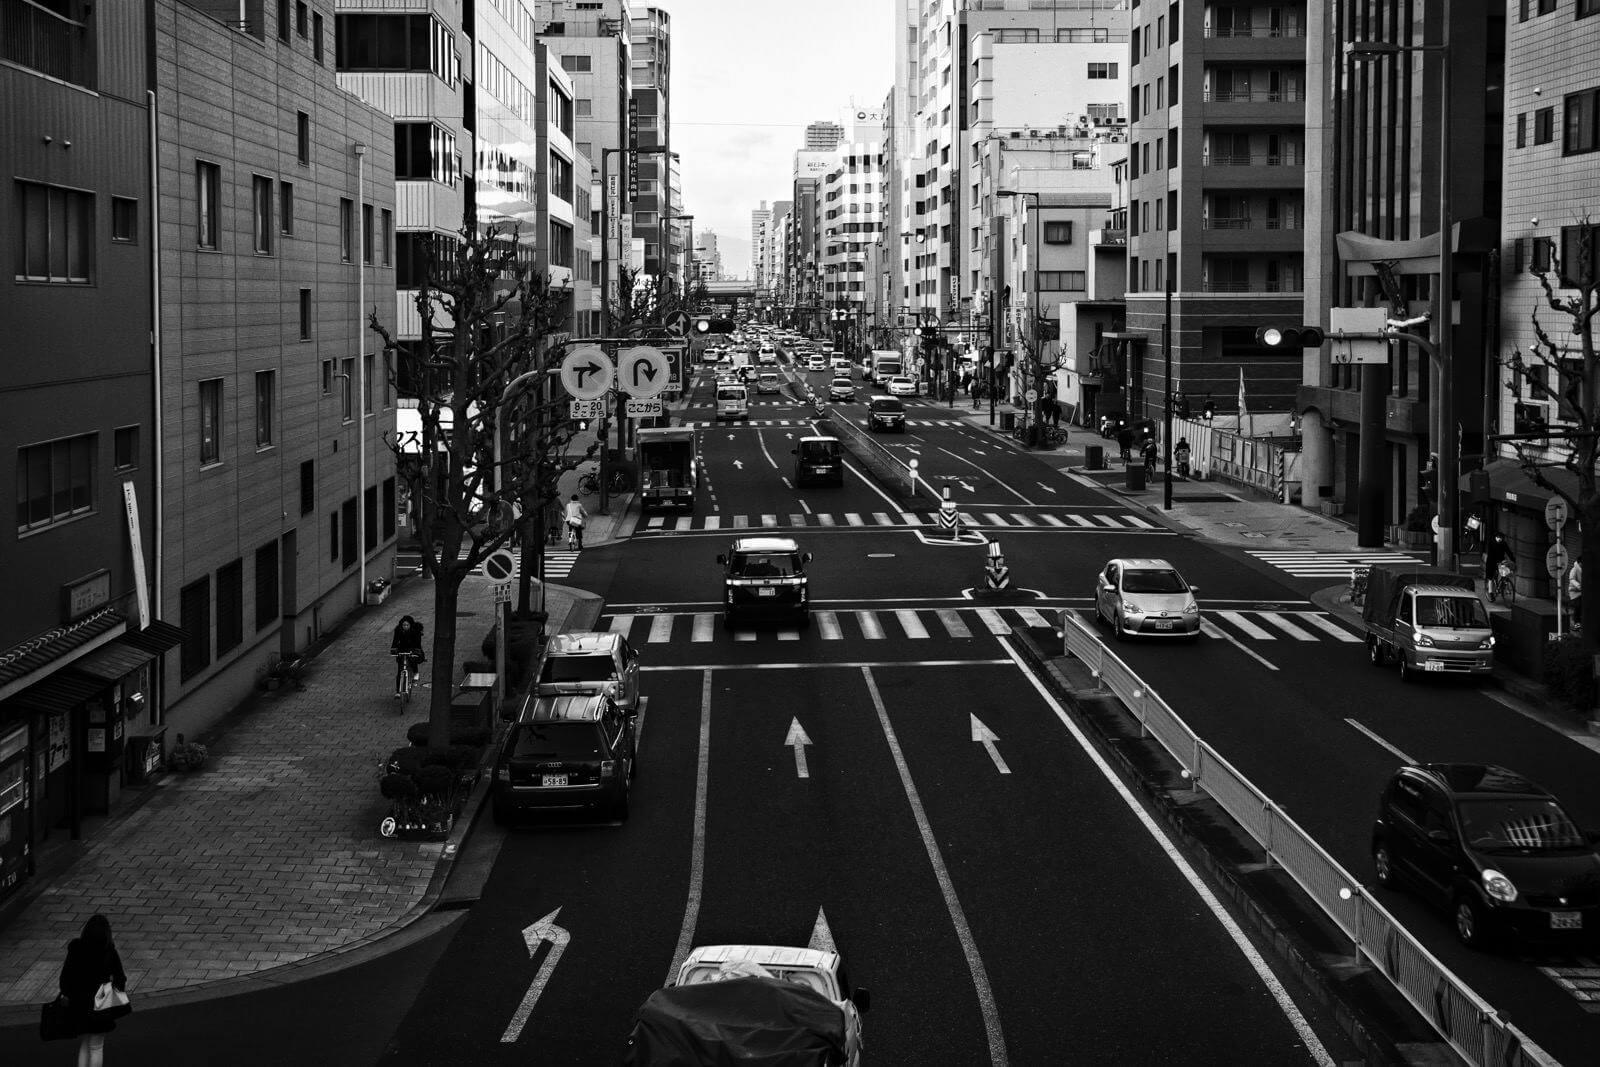 Busy road in Osaka, Japan - Photo by Zdenek Sindelar of CuriousZed Photography